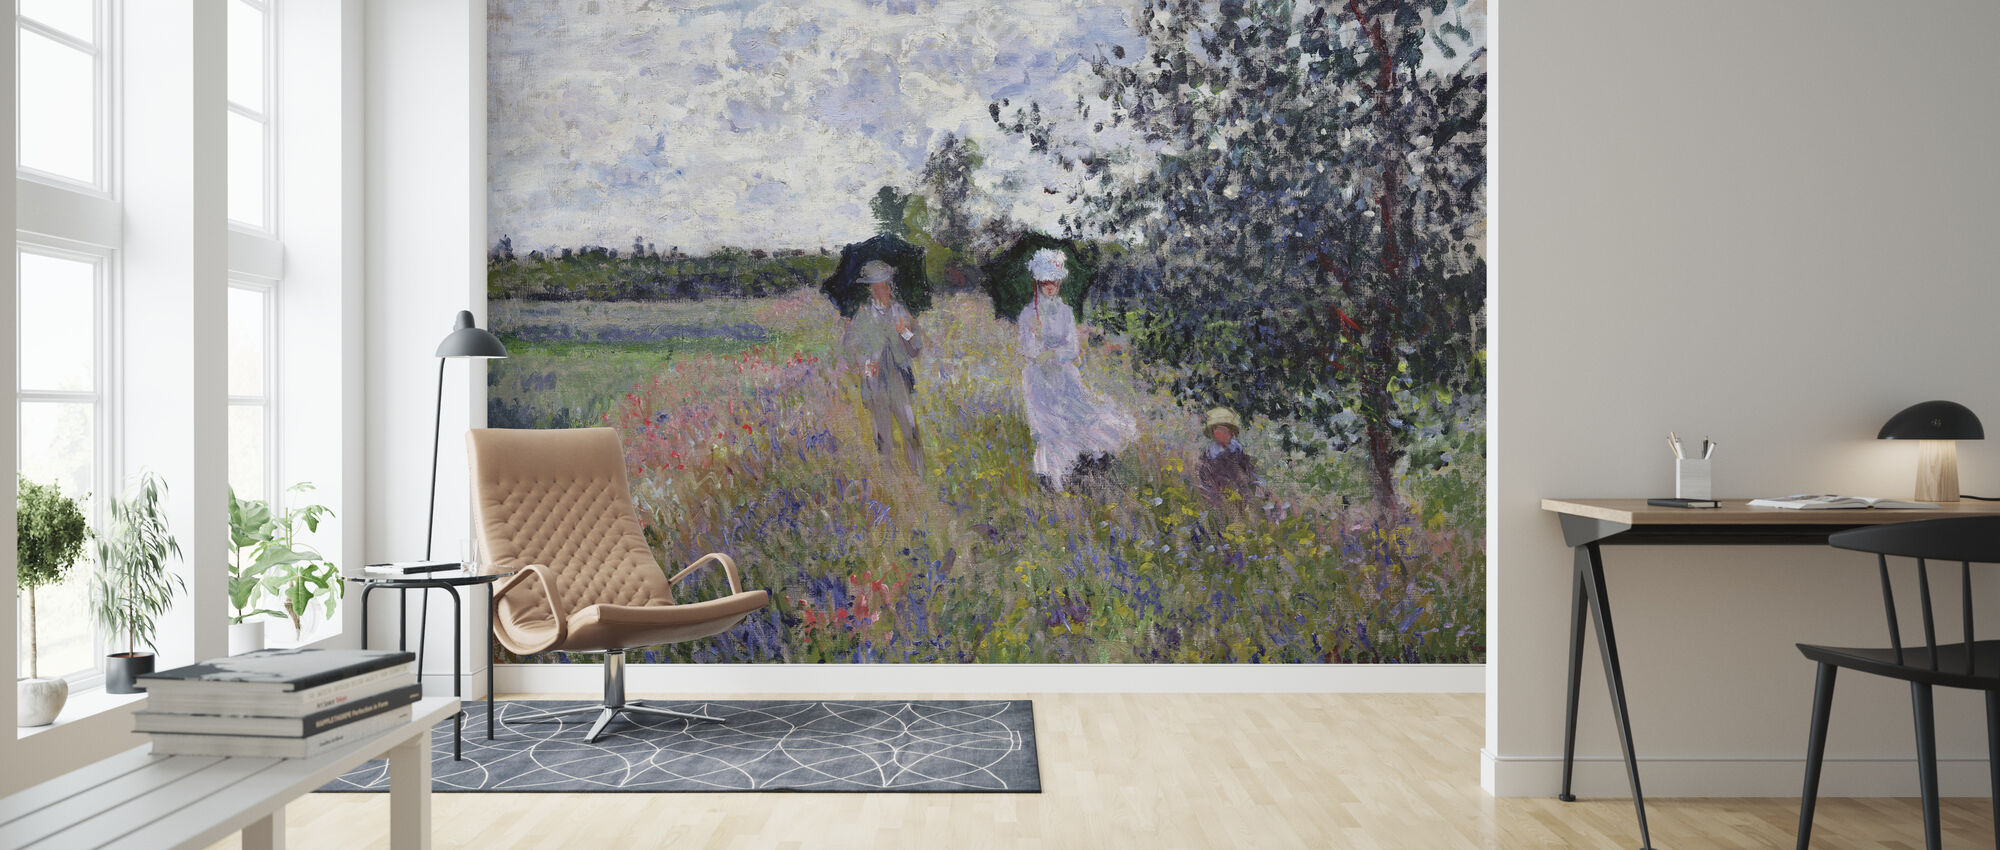 Promenade - Claude Monet - Behang - Woonkamer